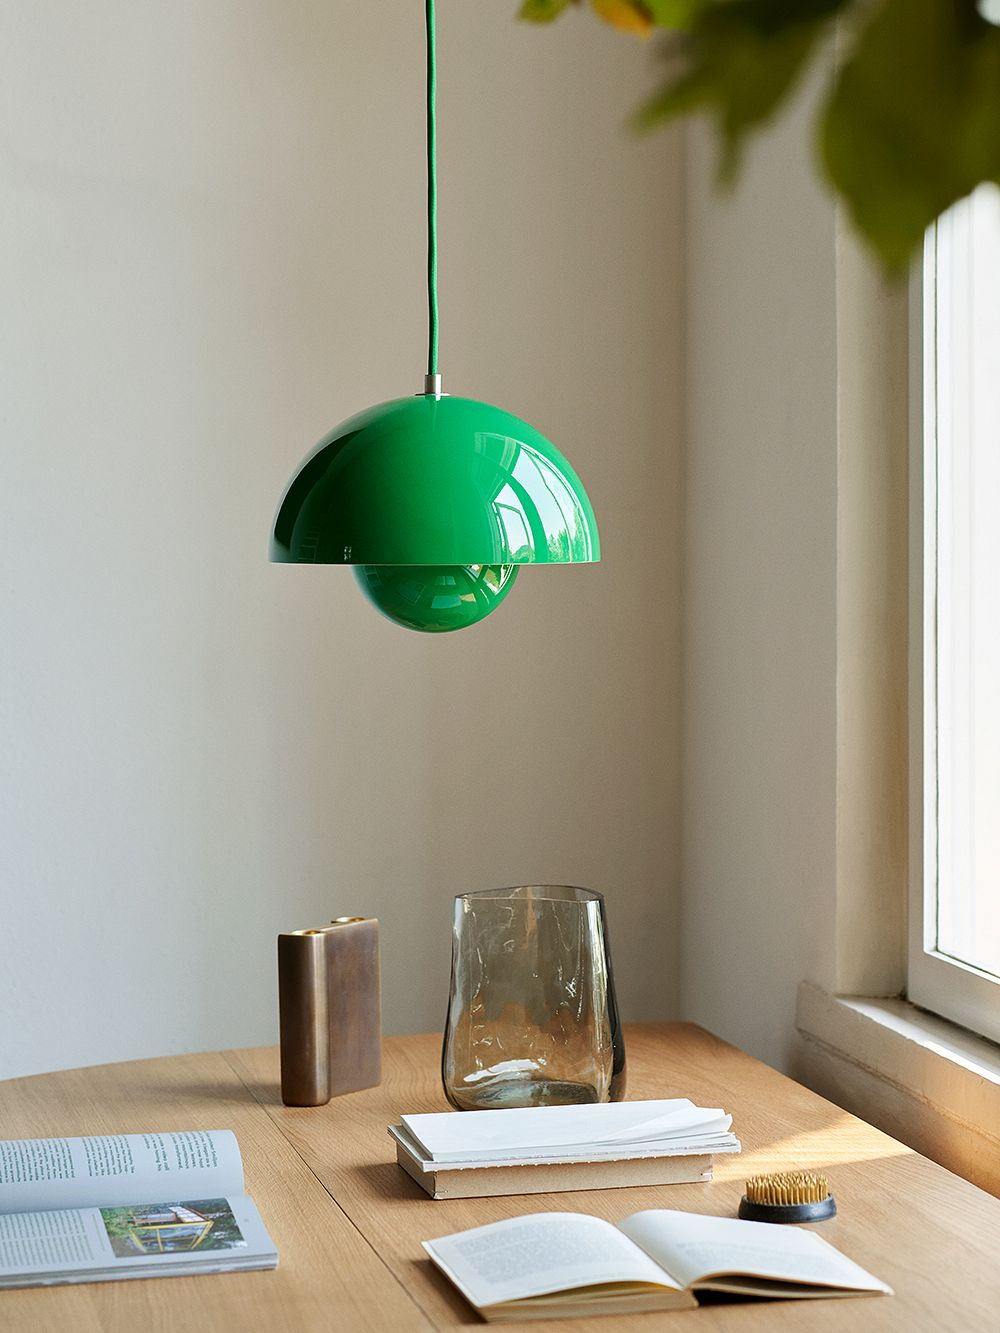 &Tradition Flowerpot VP1 pendant, signal green